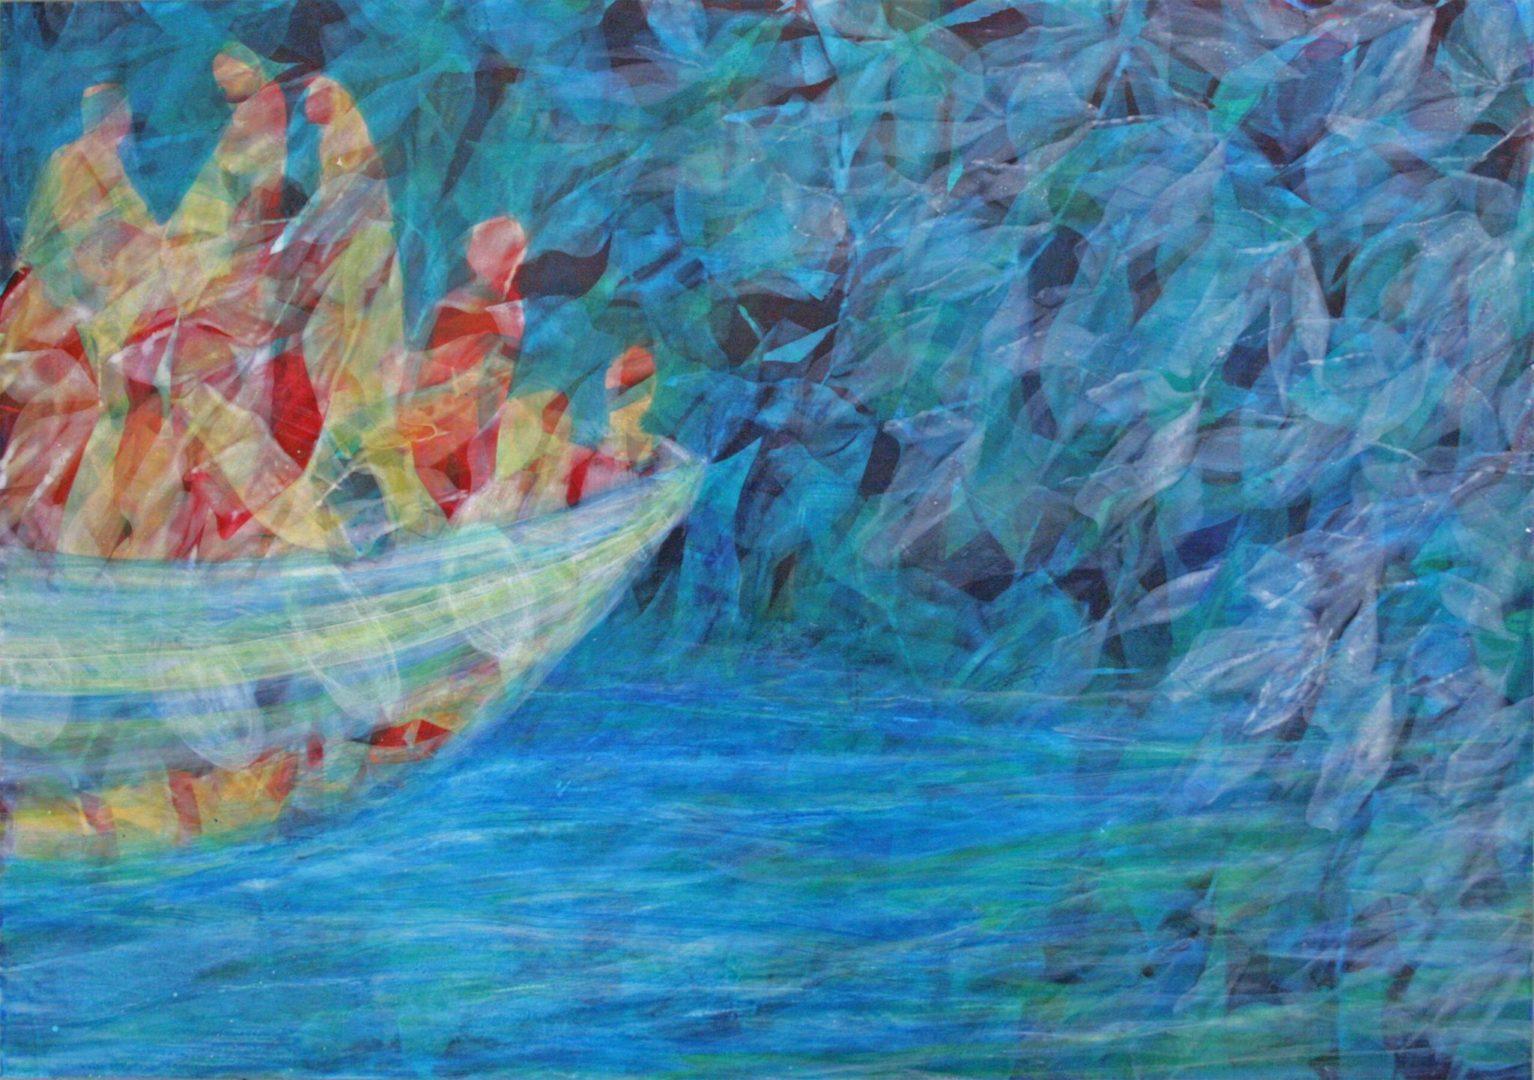 Unterwegs IV - Acryl Lasur auf Alu Dibond, 50 x 70 cm, 2018 ©Ursula Heermann-Jensen